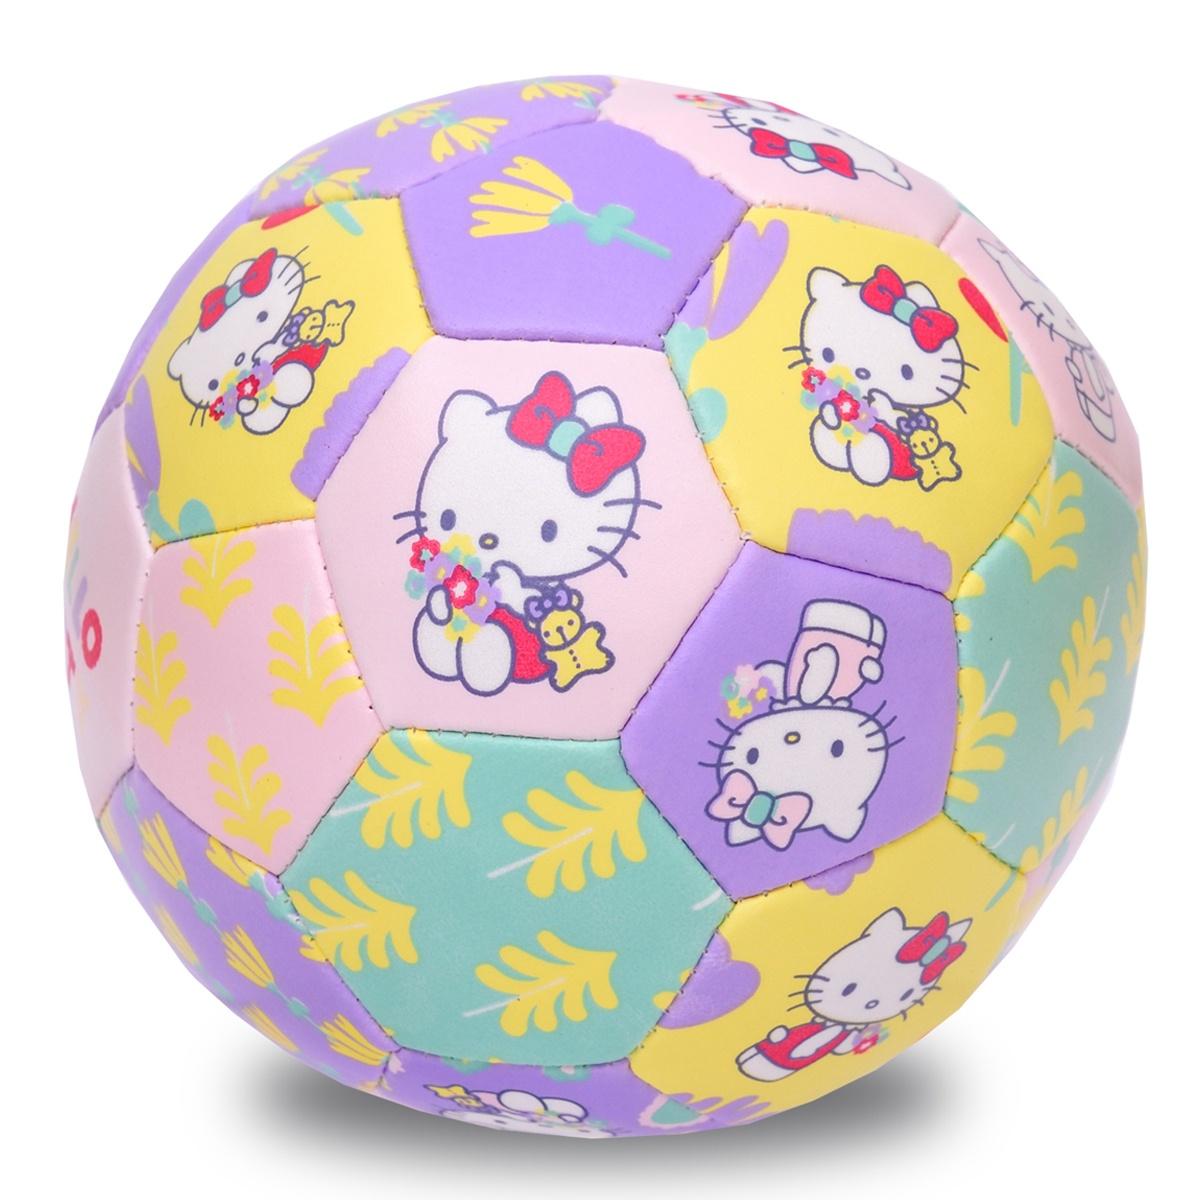 Мяч ЯиГрушка мягкий 10 см Hello Kitty -2 арт. 12072ЯиГ, 1 мяч mondo hello kitty